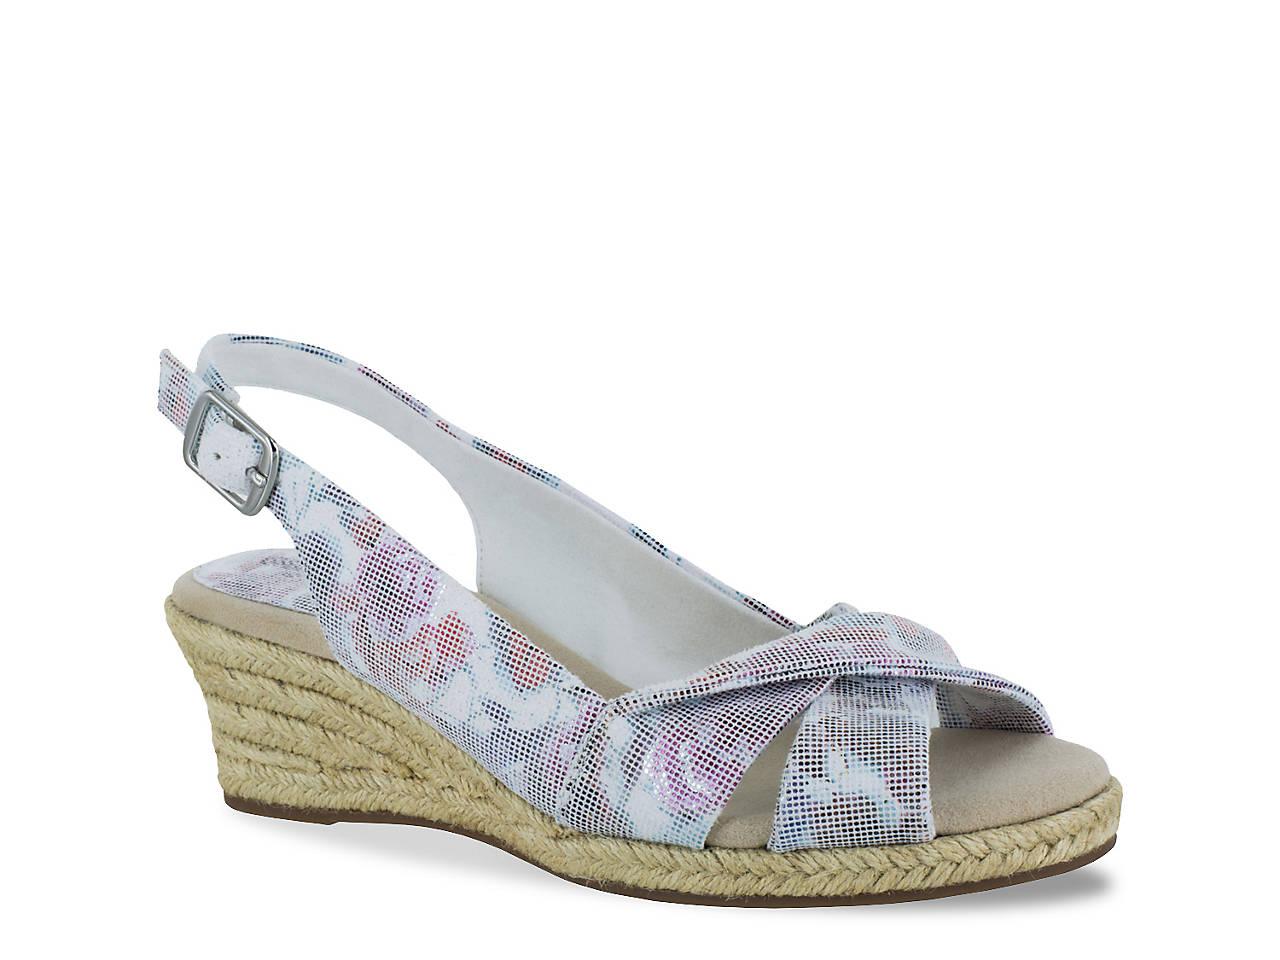 bf59aa8ac164 Easy Street Maureen Espadrille Wedge Sandal Women s Shoes